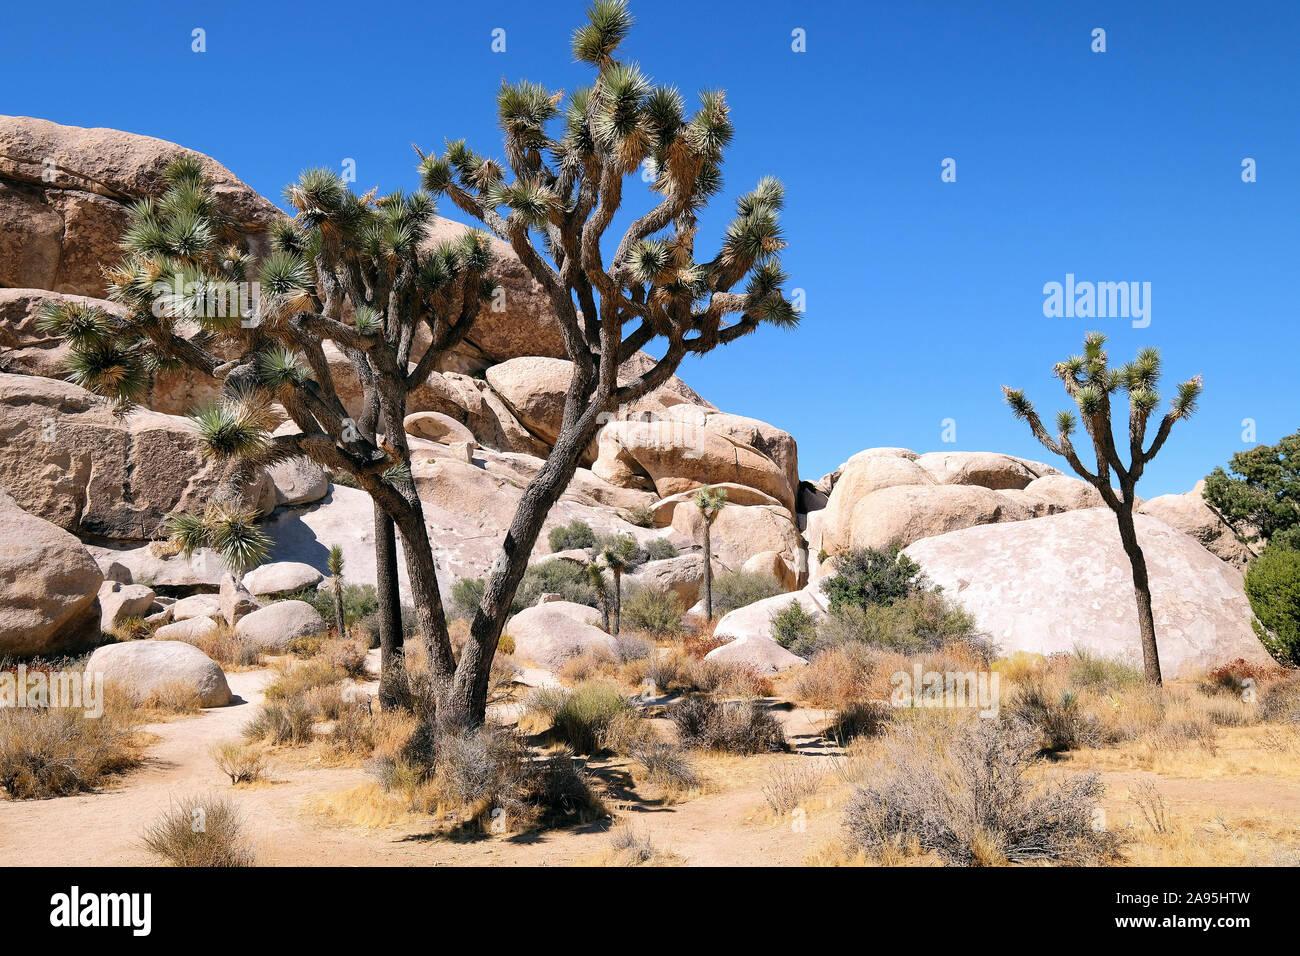 Le parc national Joshua Tree, California, USA Banque D'Images